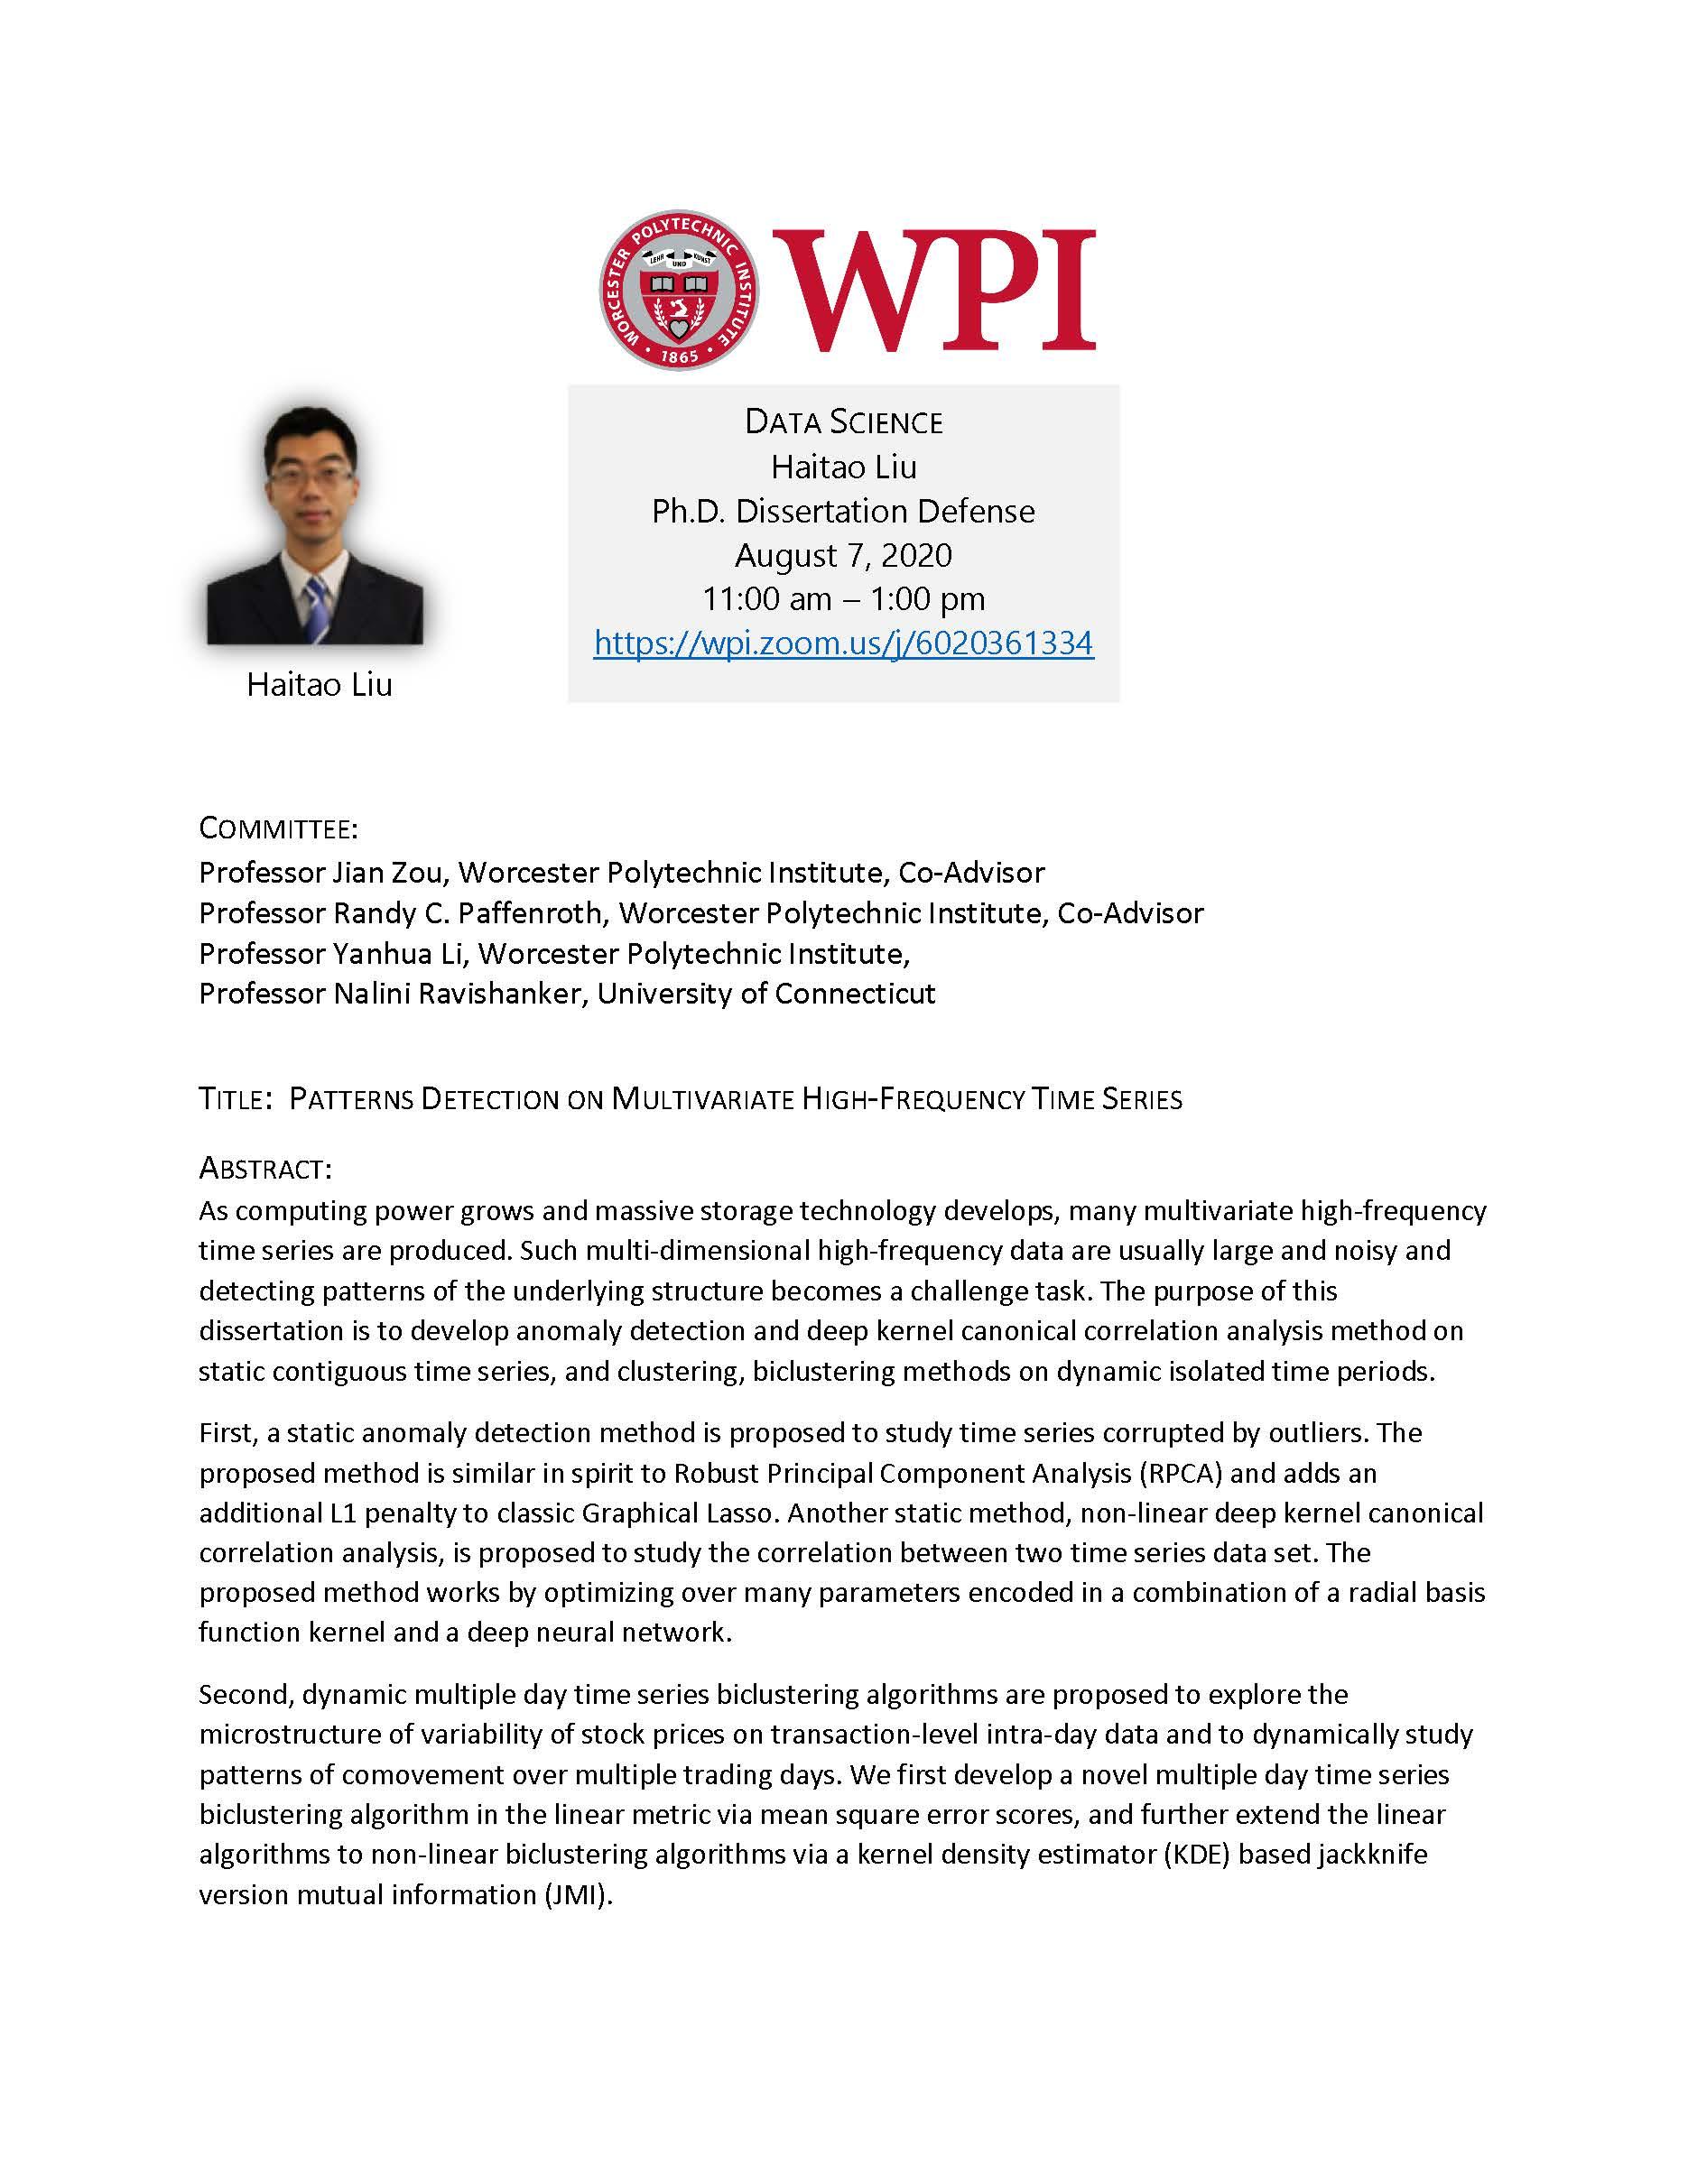 Haitao Liu dissertation defense alt